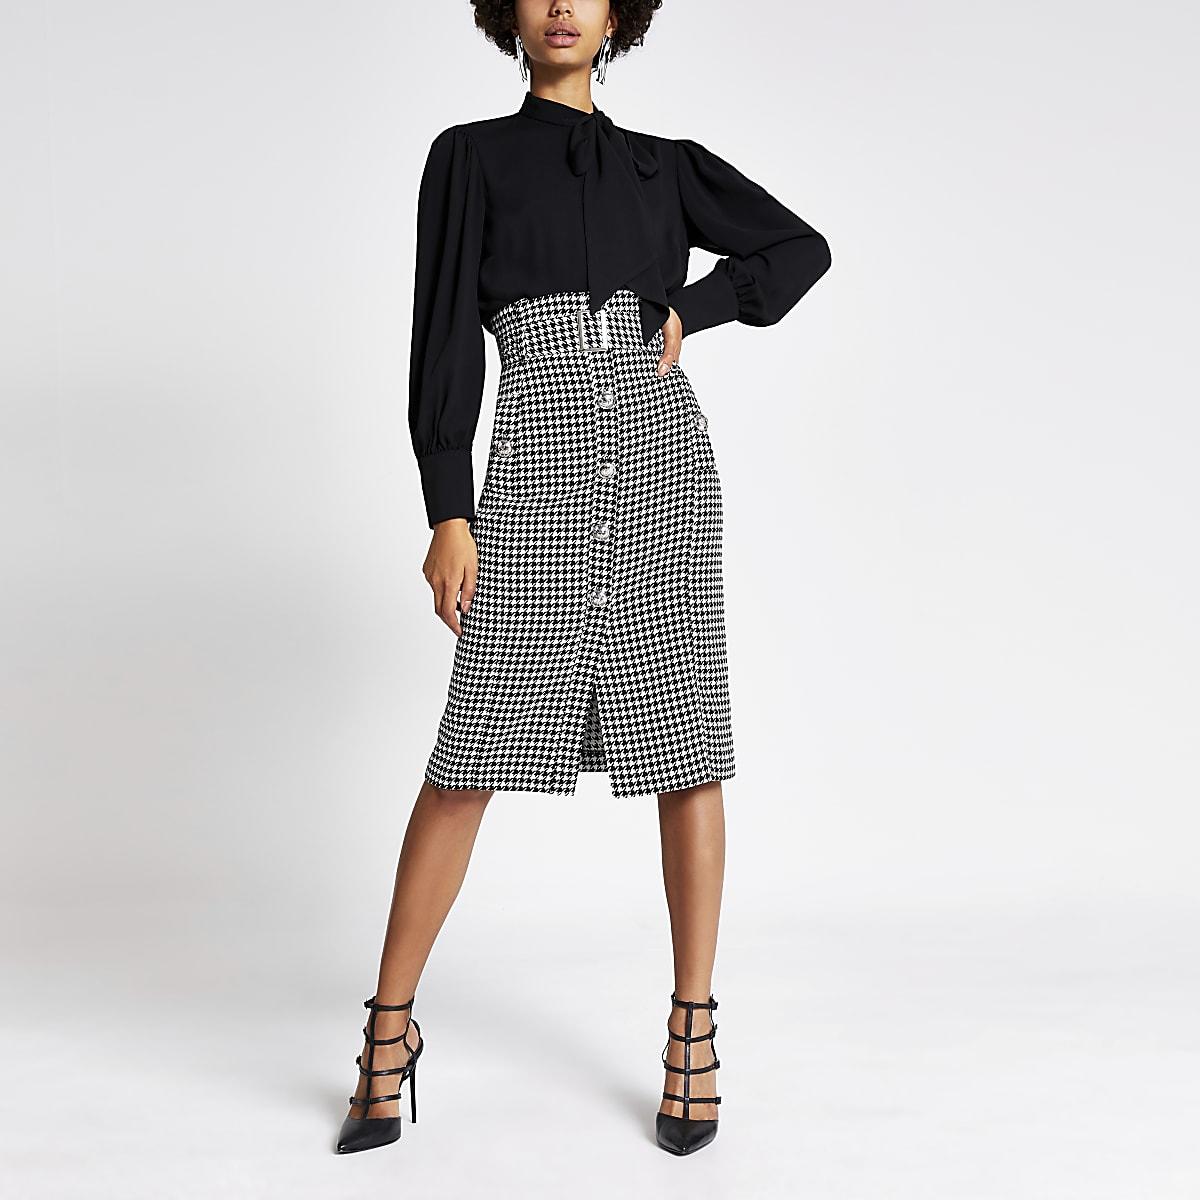 Black dogtooth paperbag midi pencil skirt